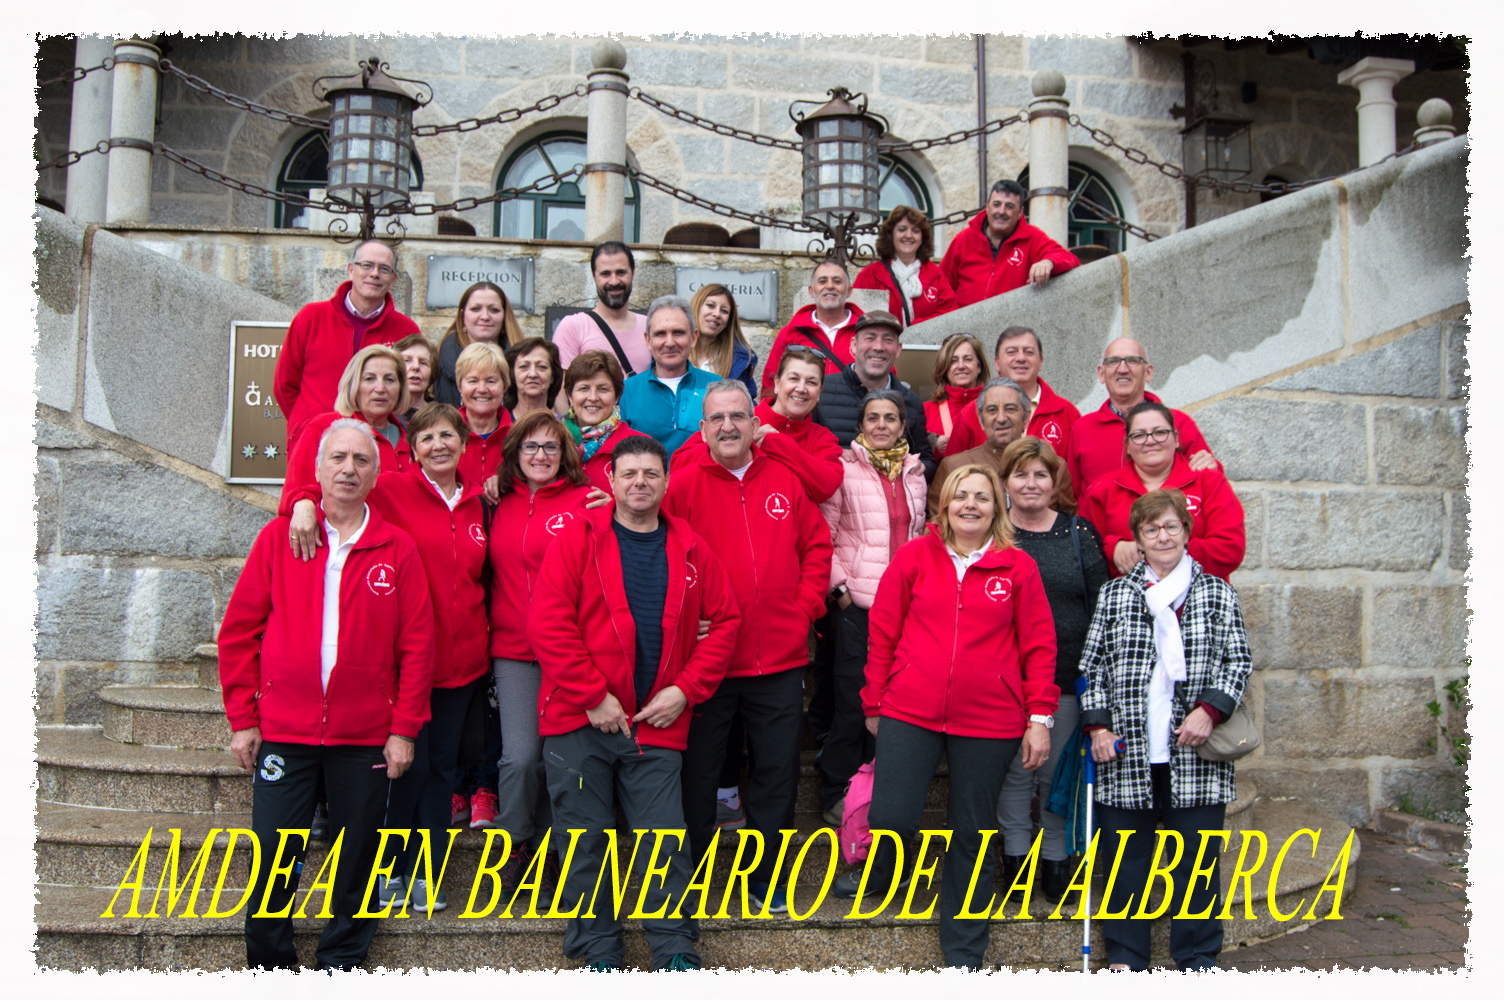 SALIDA-CONVIVENCIA AL BALNEARIO «LA ALBERCA» (SALAMANCA)